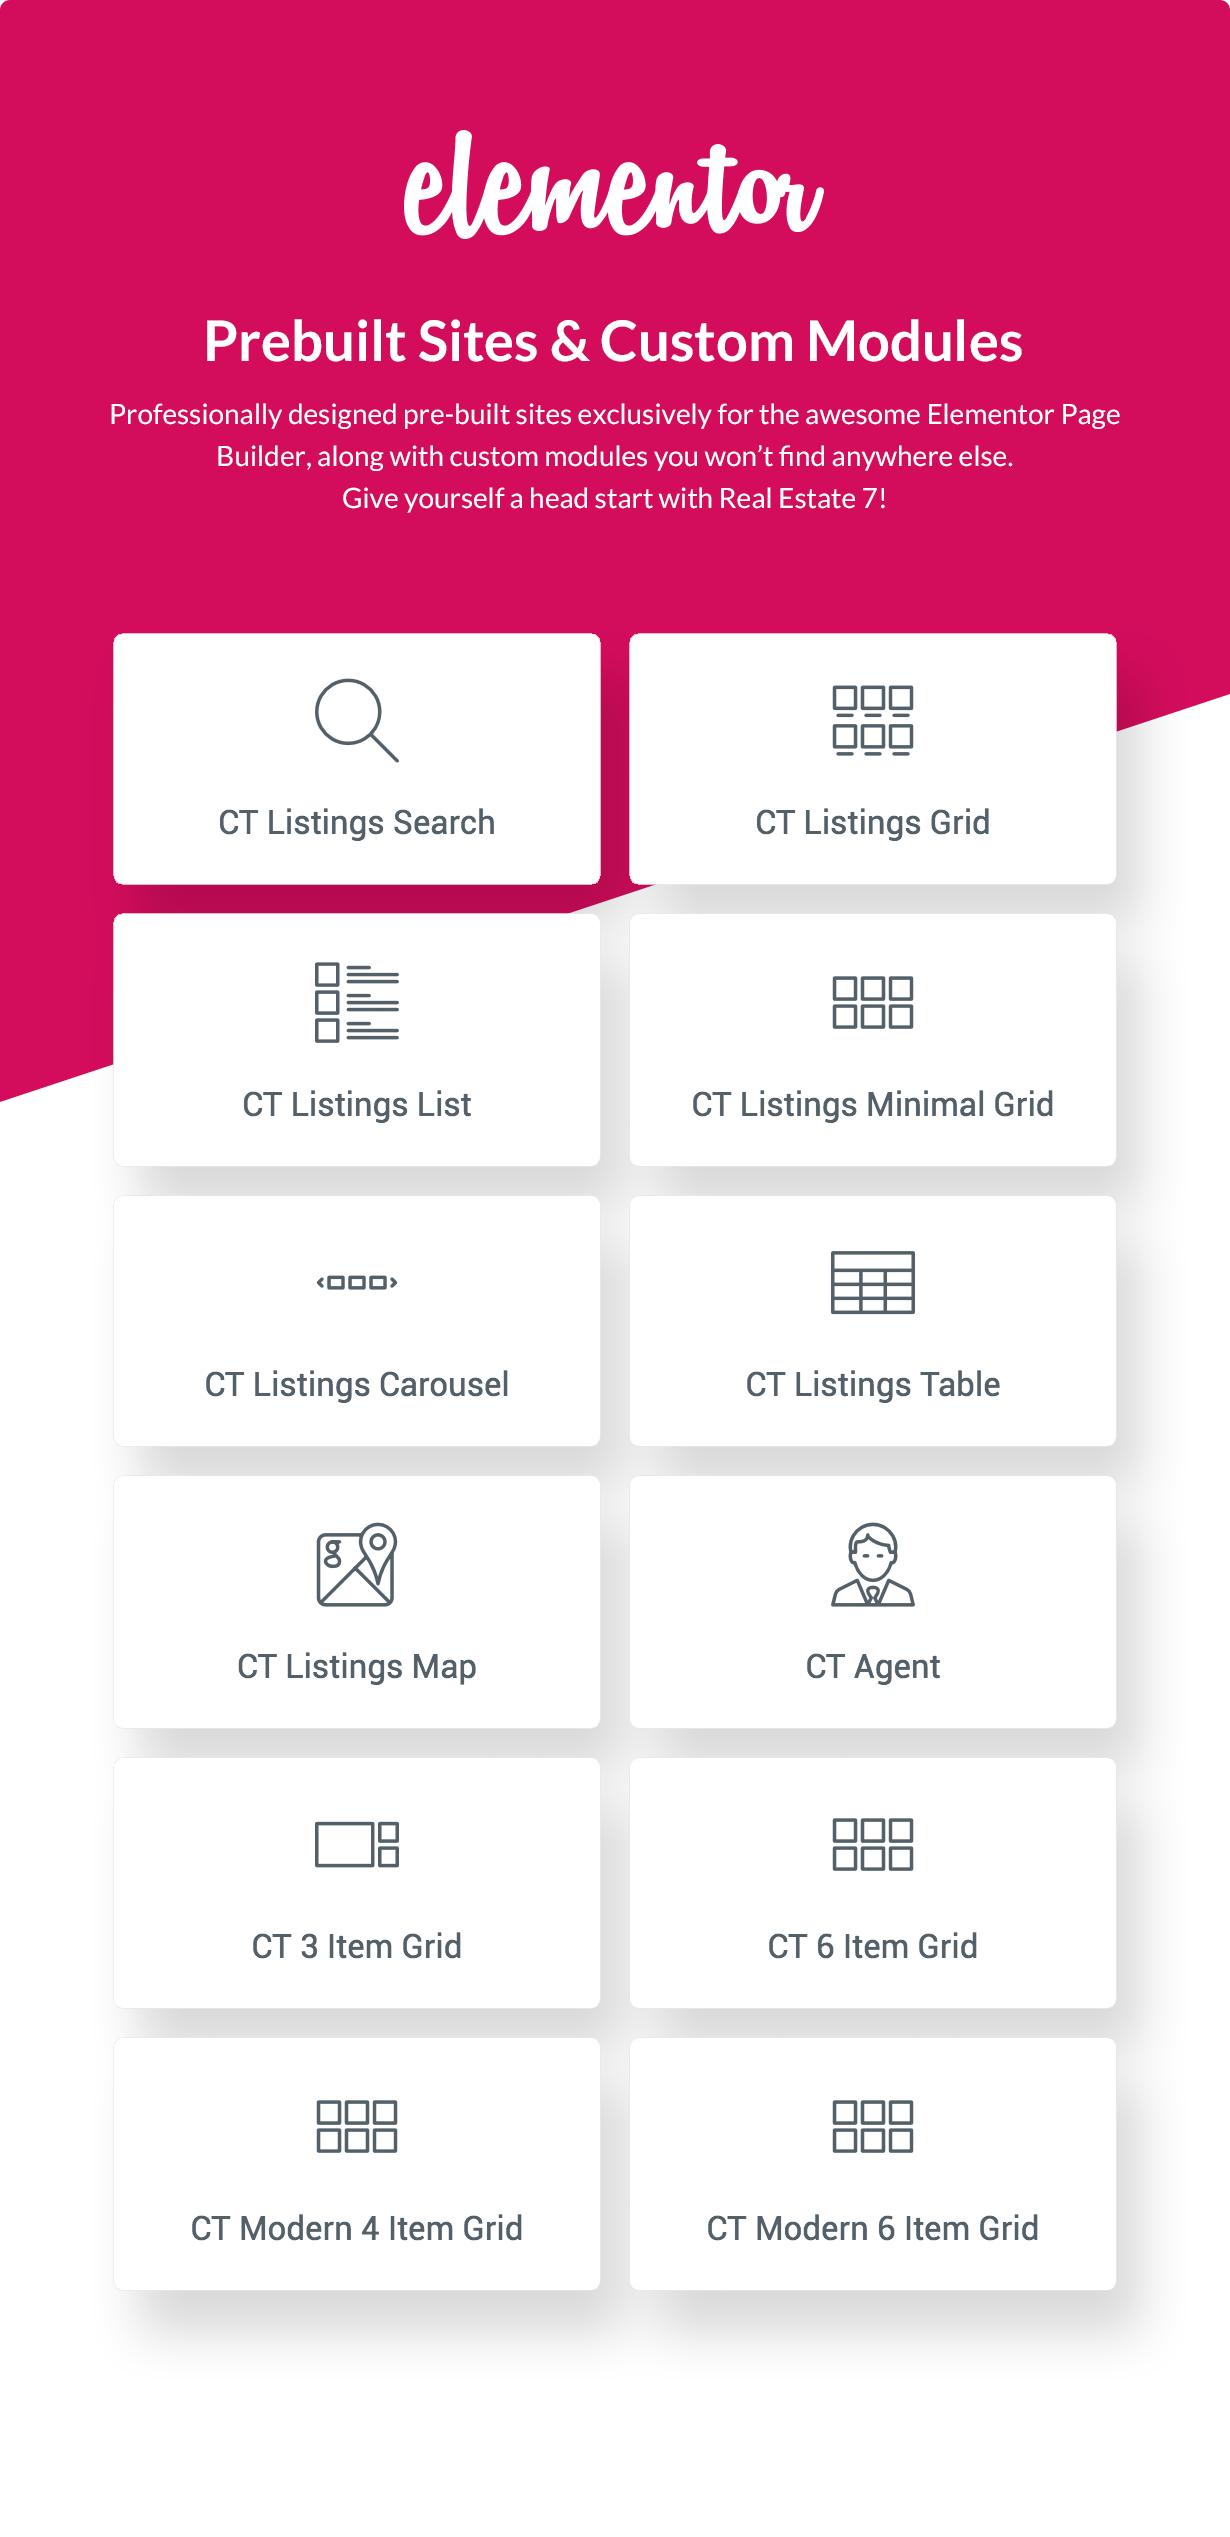 Elementor & Real Estate 7 - Prebuilt Sites & Custom Modules